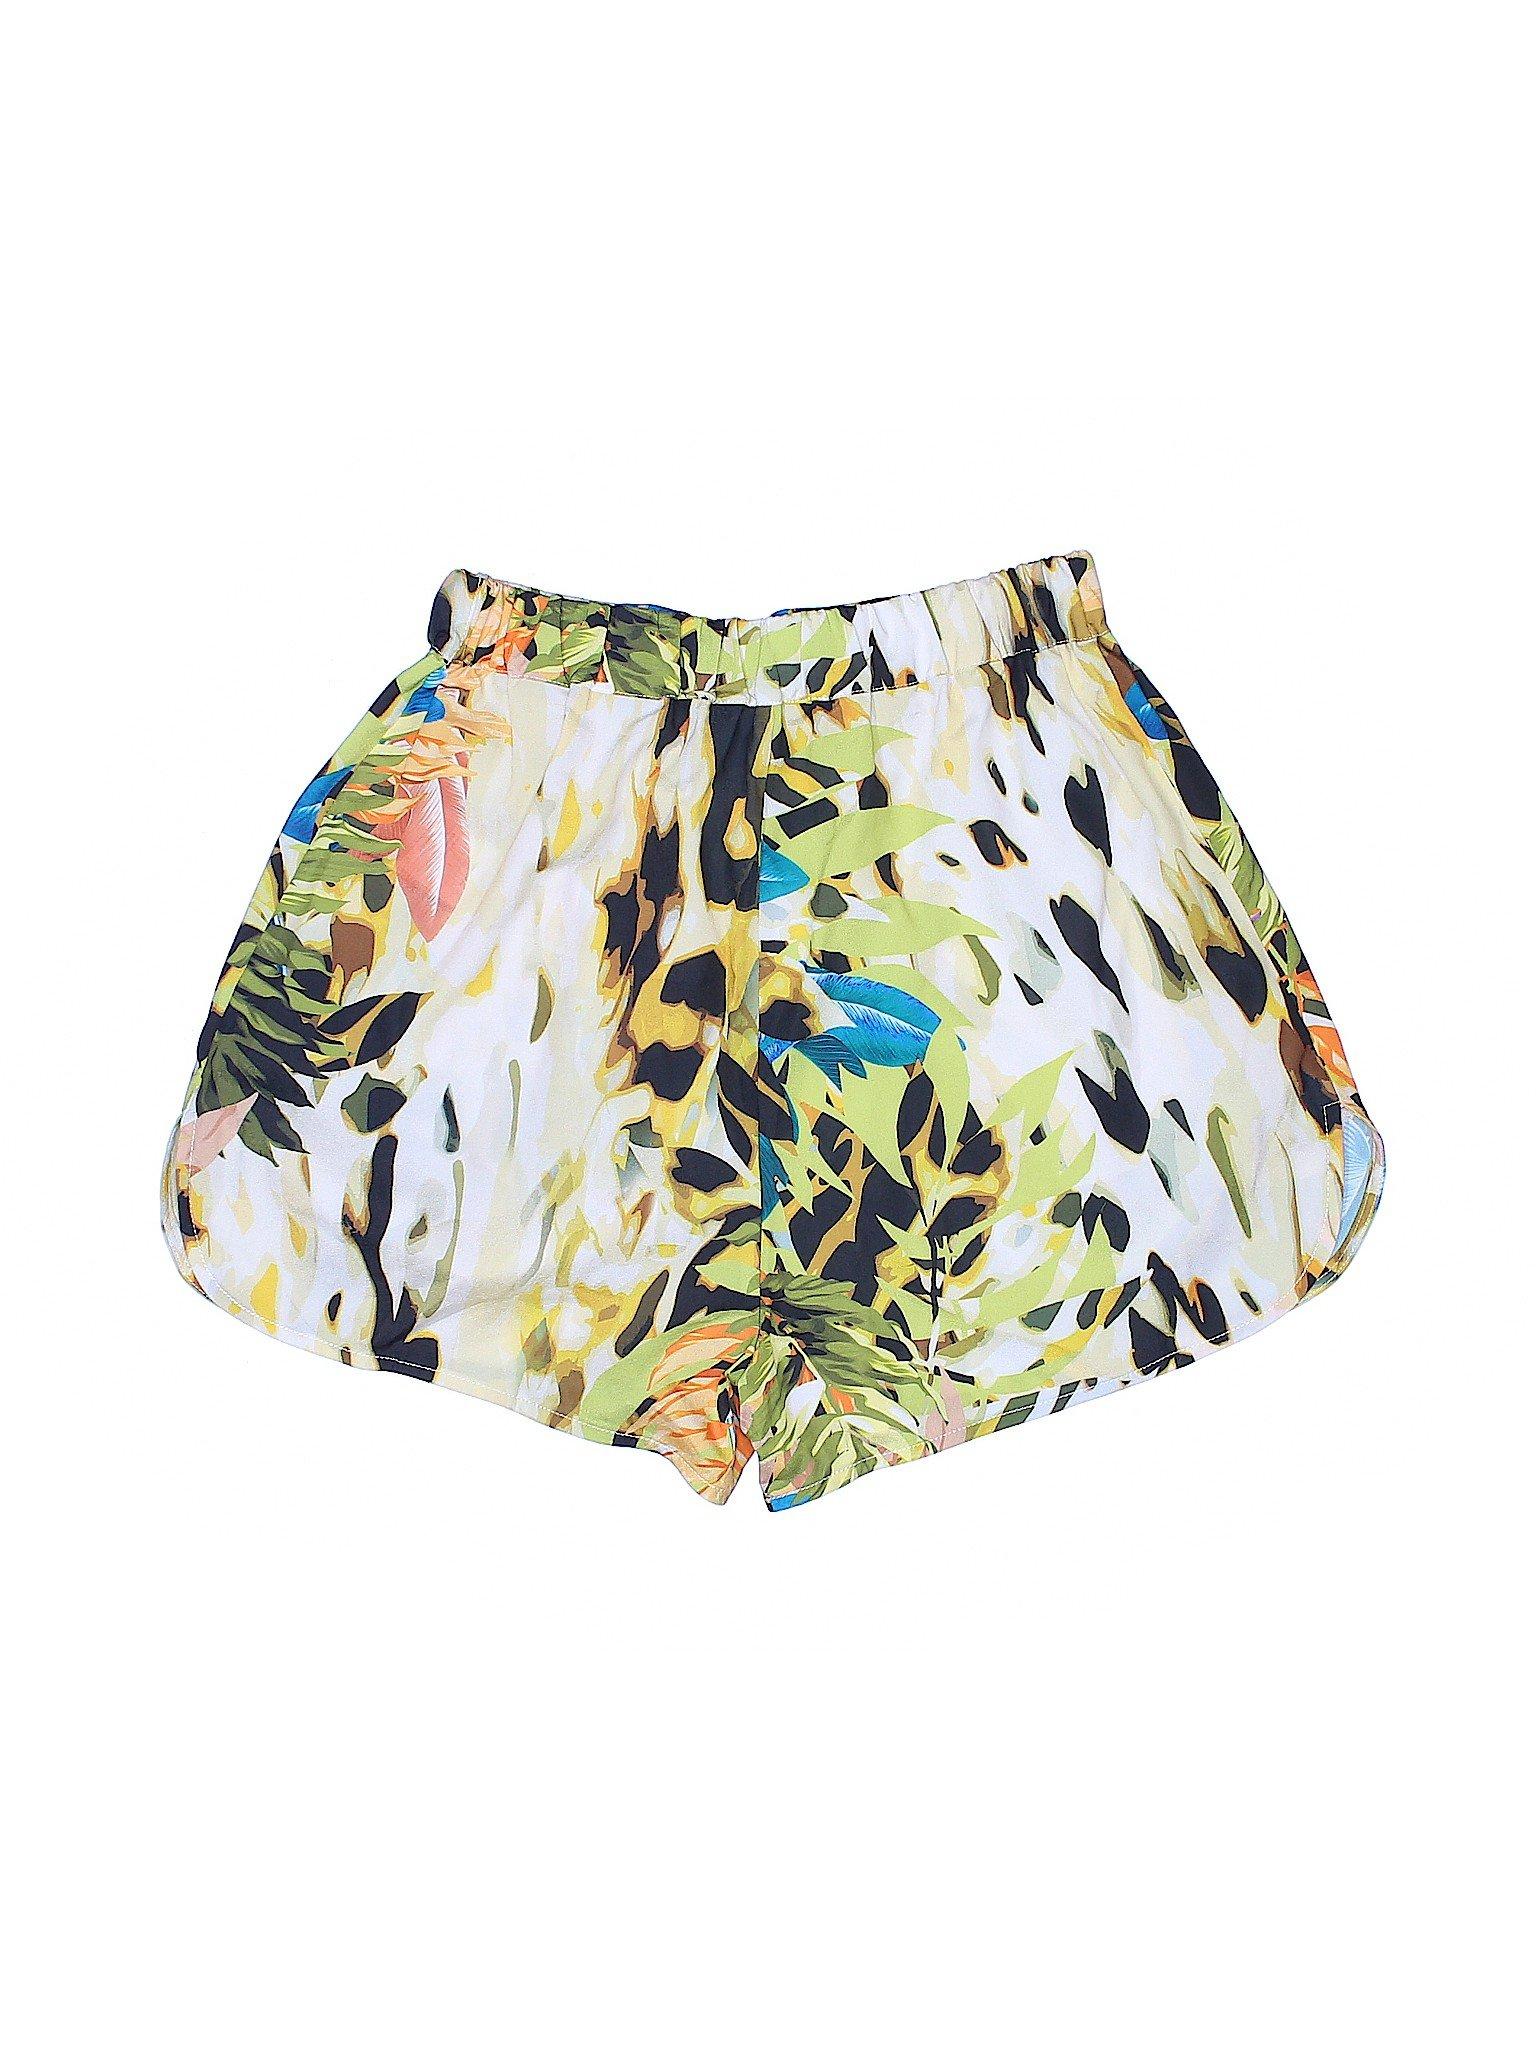 Bebe Bebe Boutique Bebe Boutique Shorts Shorts Shorts Boutique Boutique PTpwqnFnO